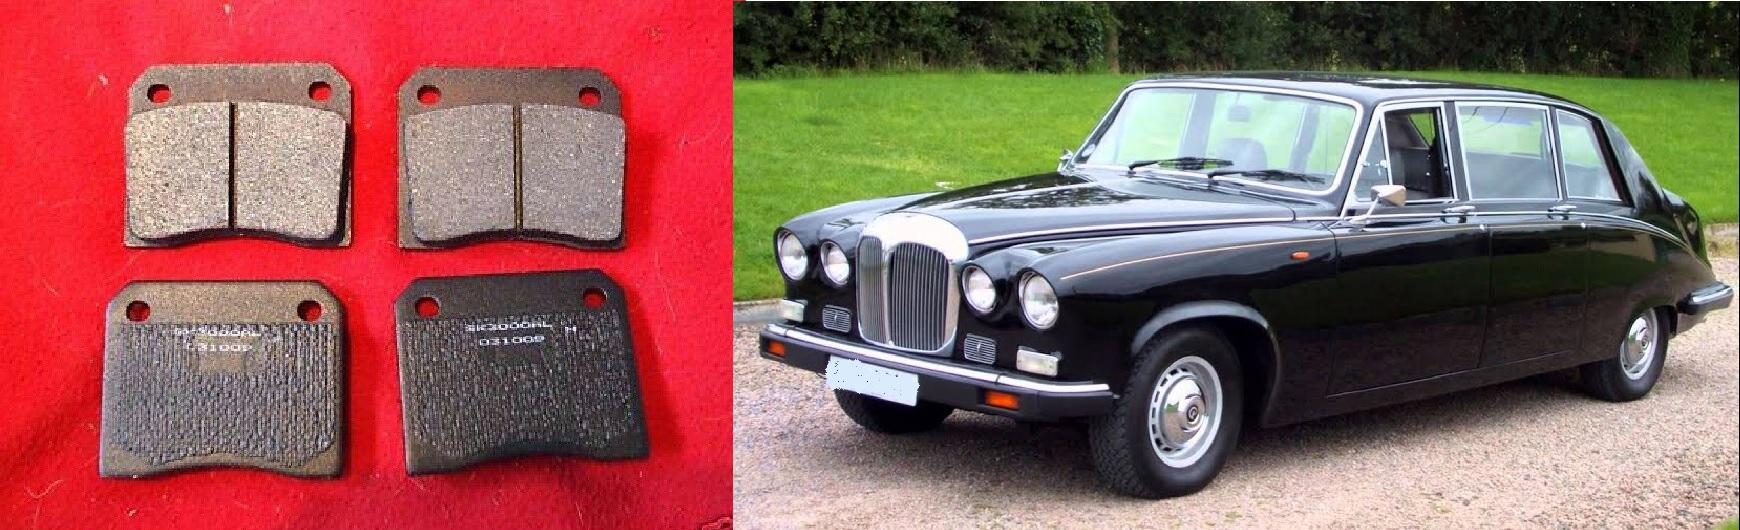 REAR BRAKE PADS SET (Daimler DS420 Limousine) (Sep 1975- 92)